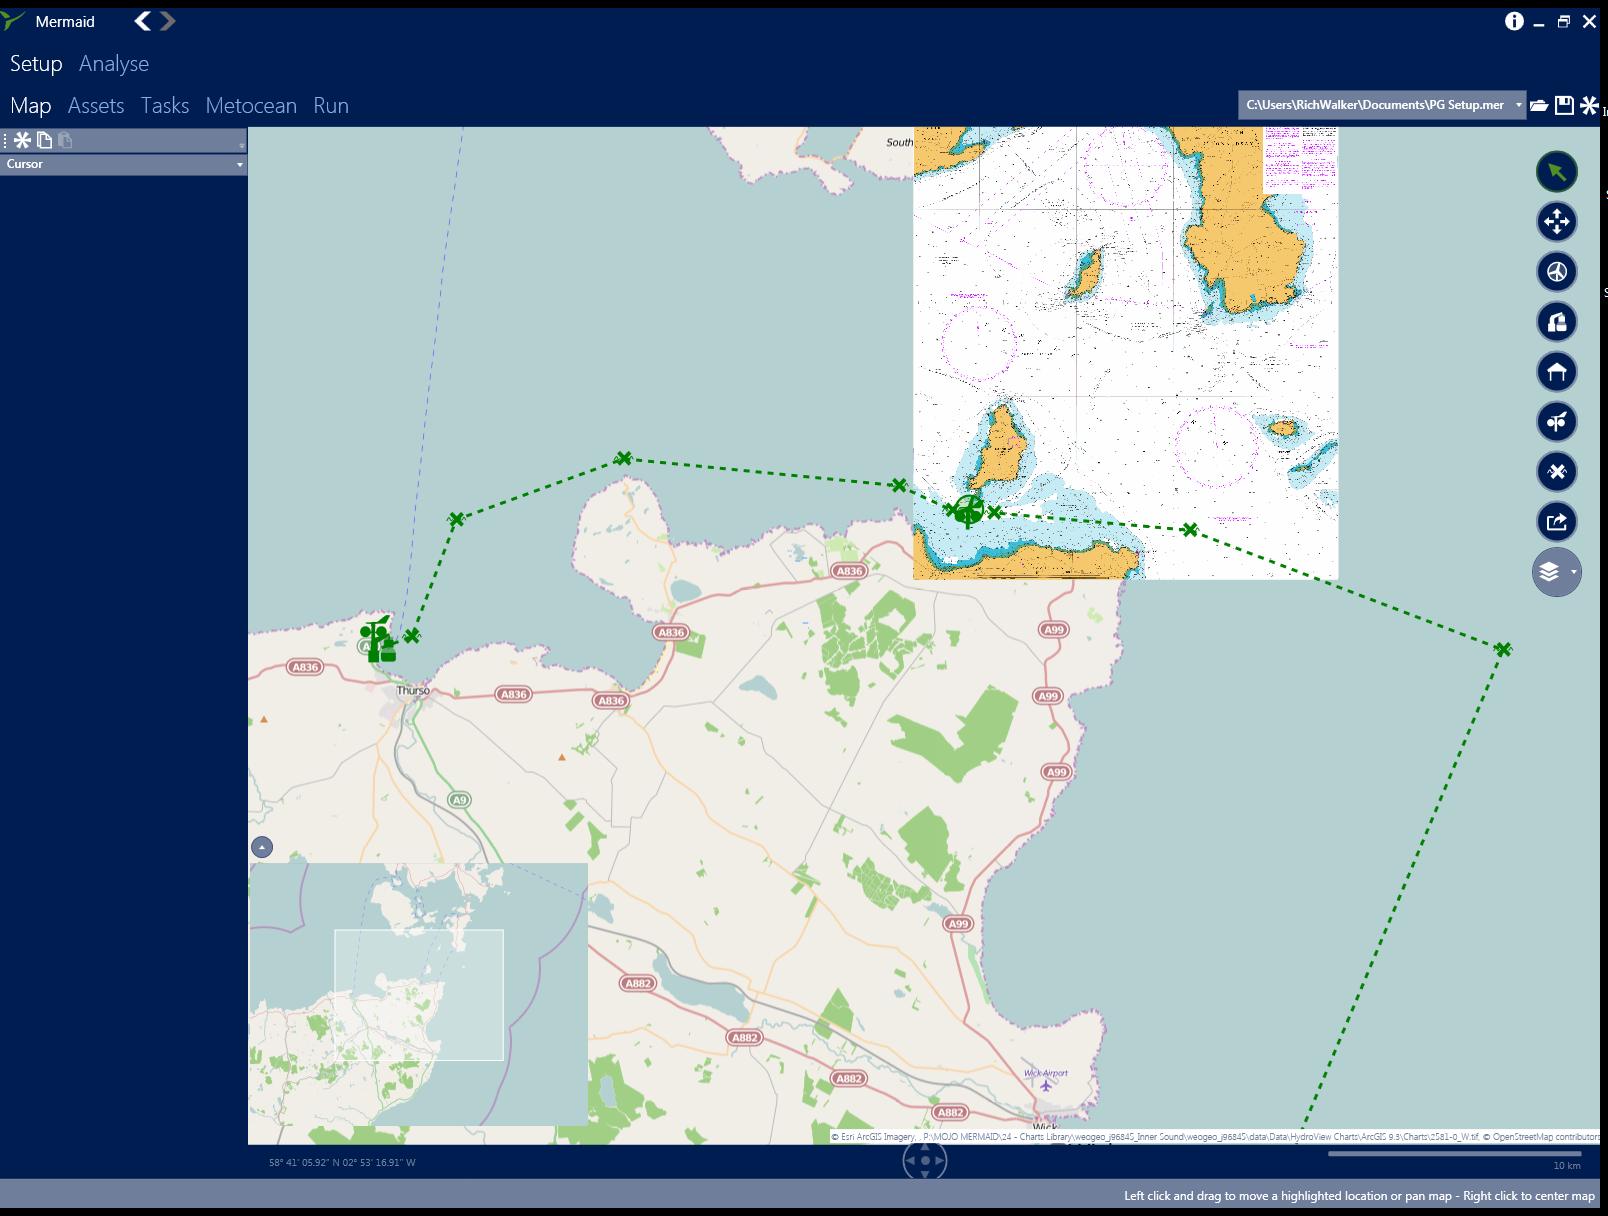 Mojo Maritime launches Mermaid, a sophisticated marine